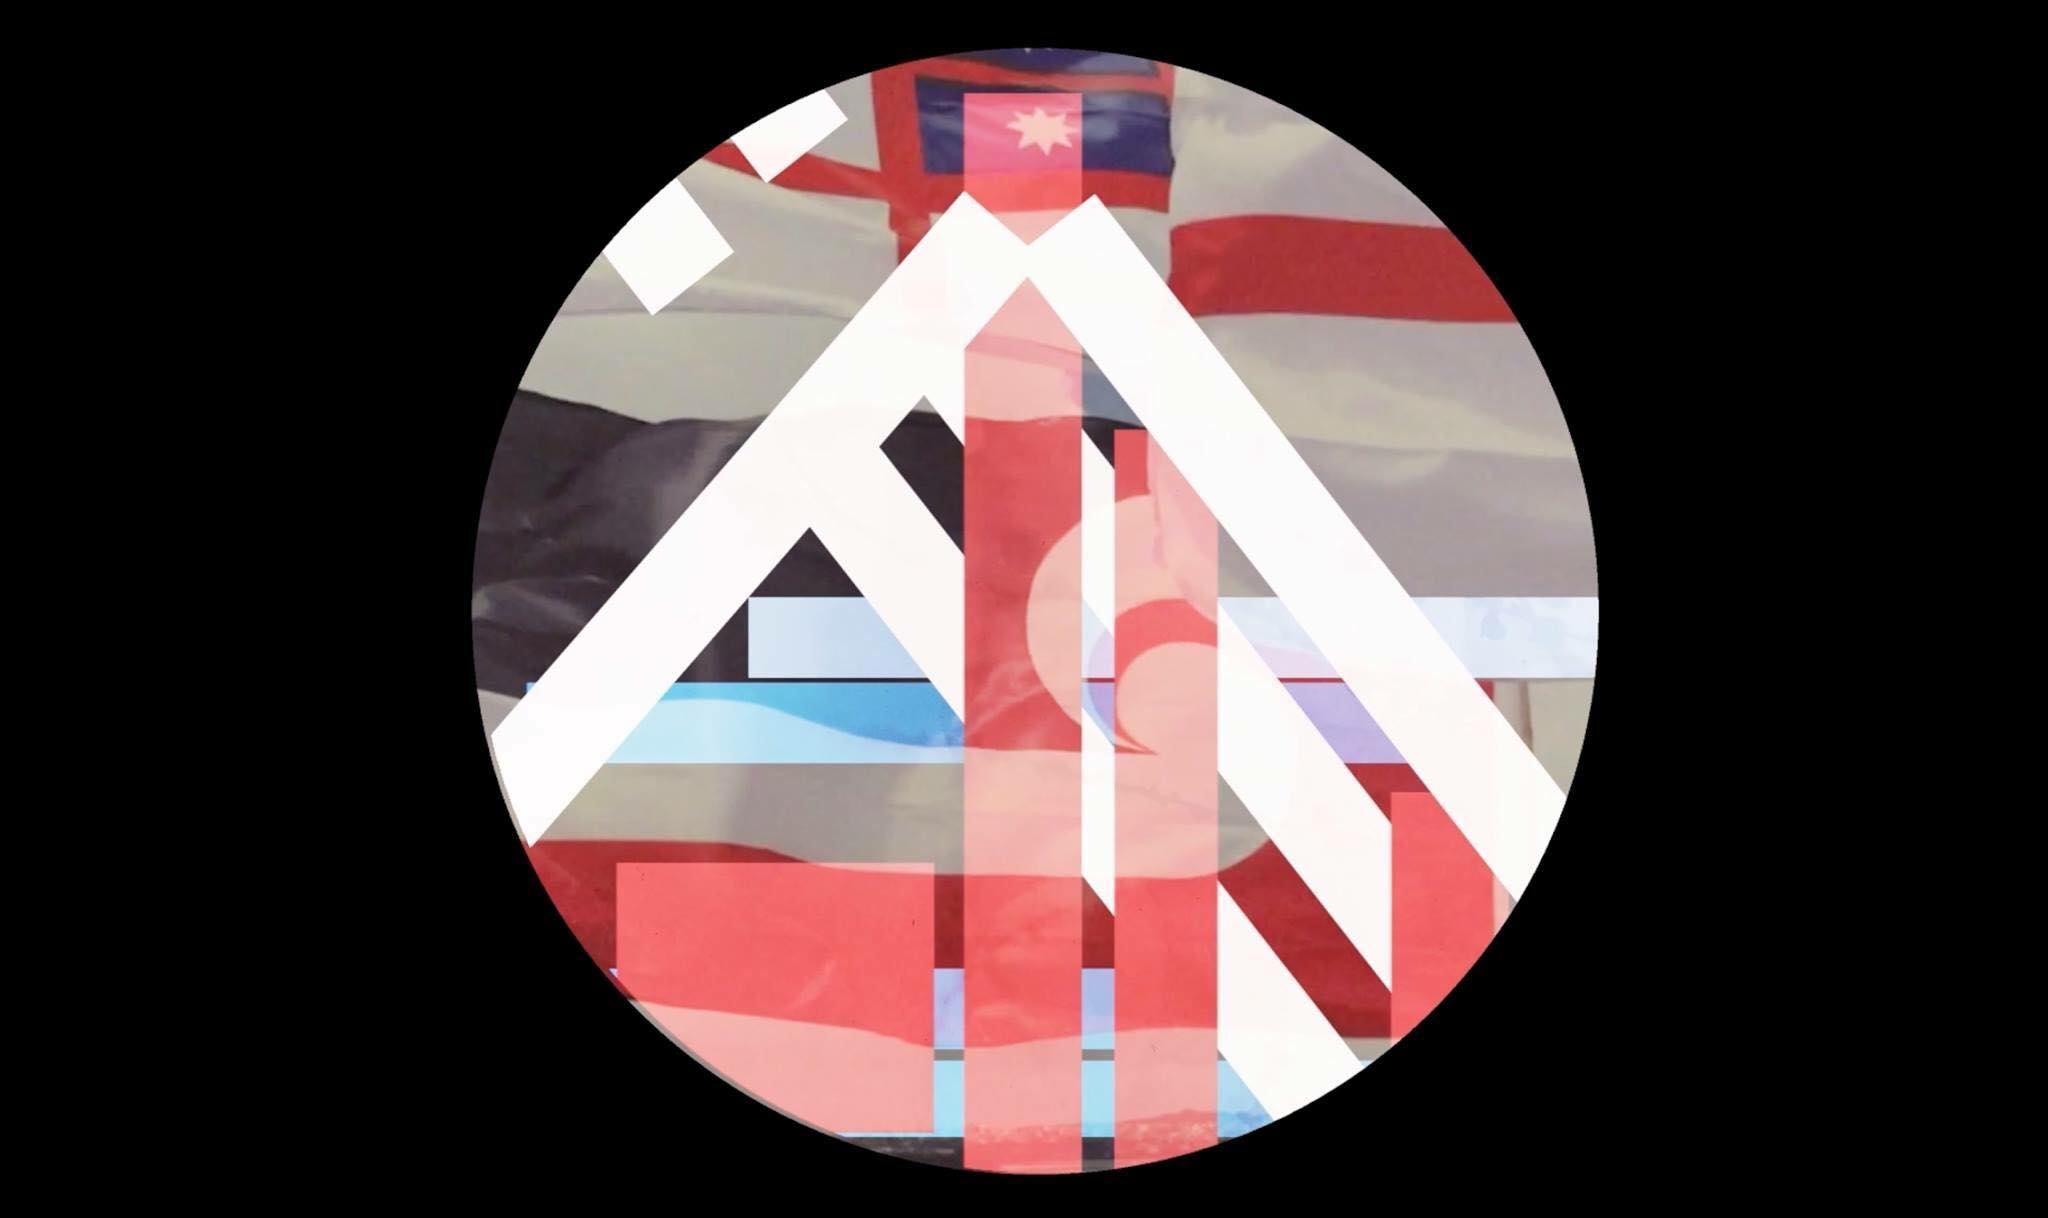 Image still from Jamie's collaborative work titled  'Karanga'.